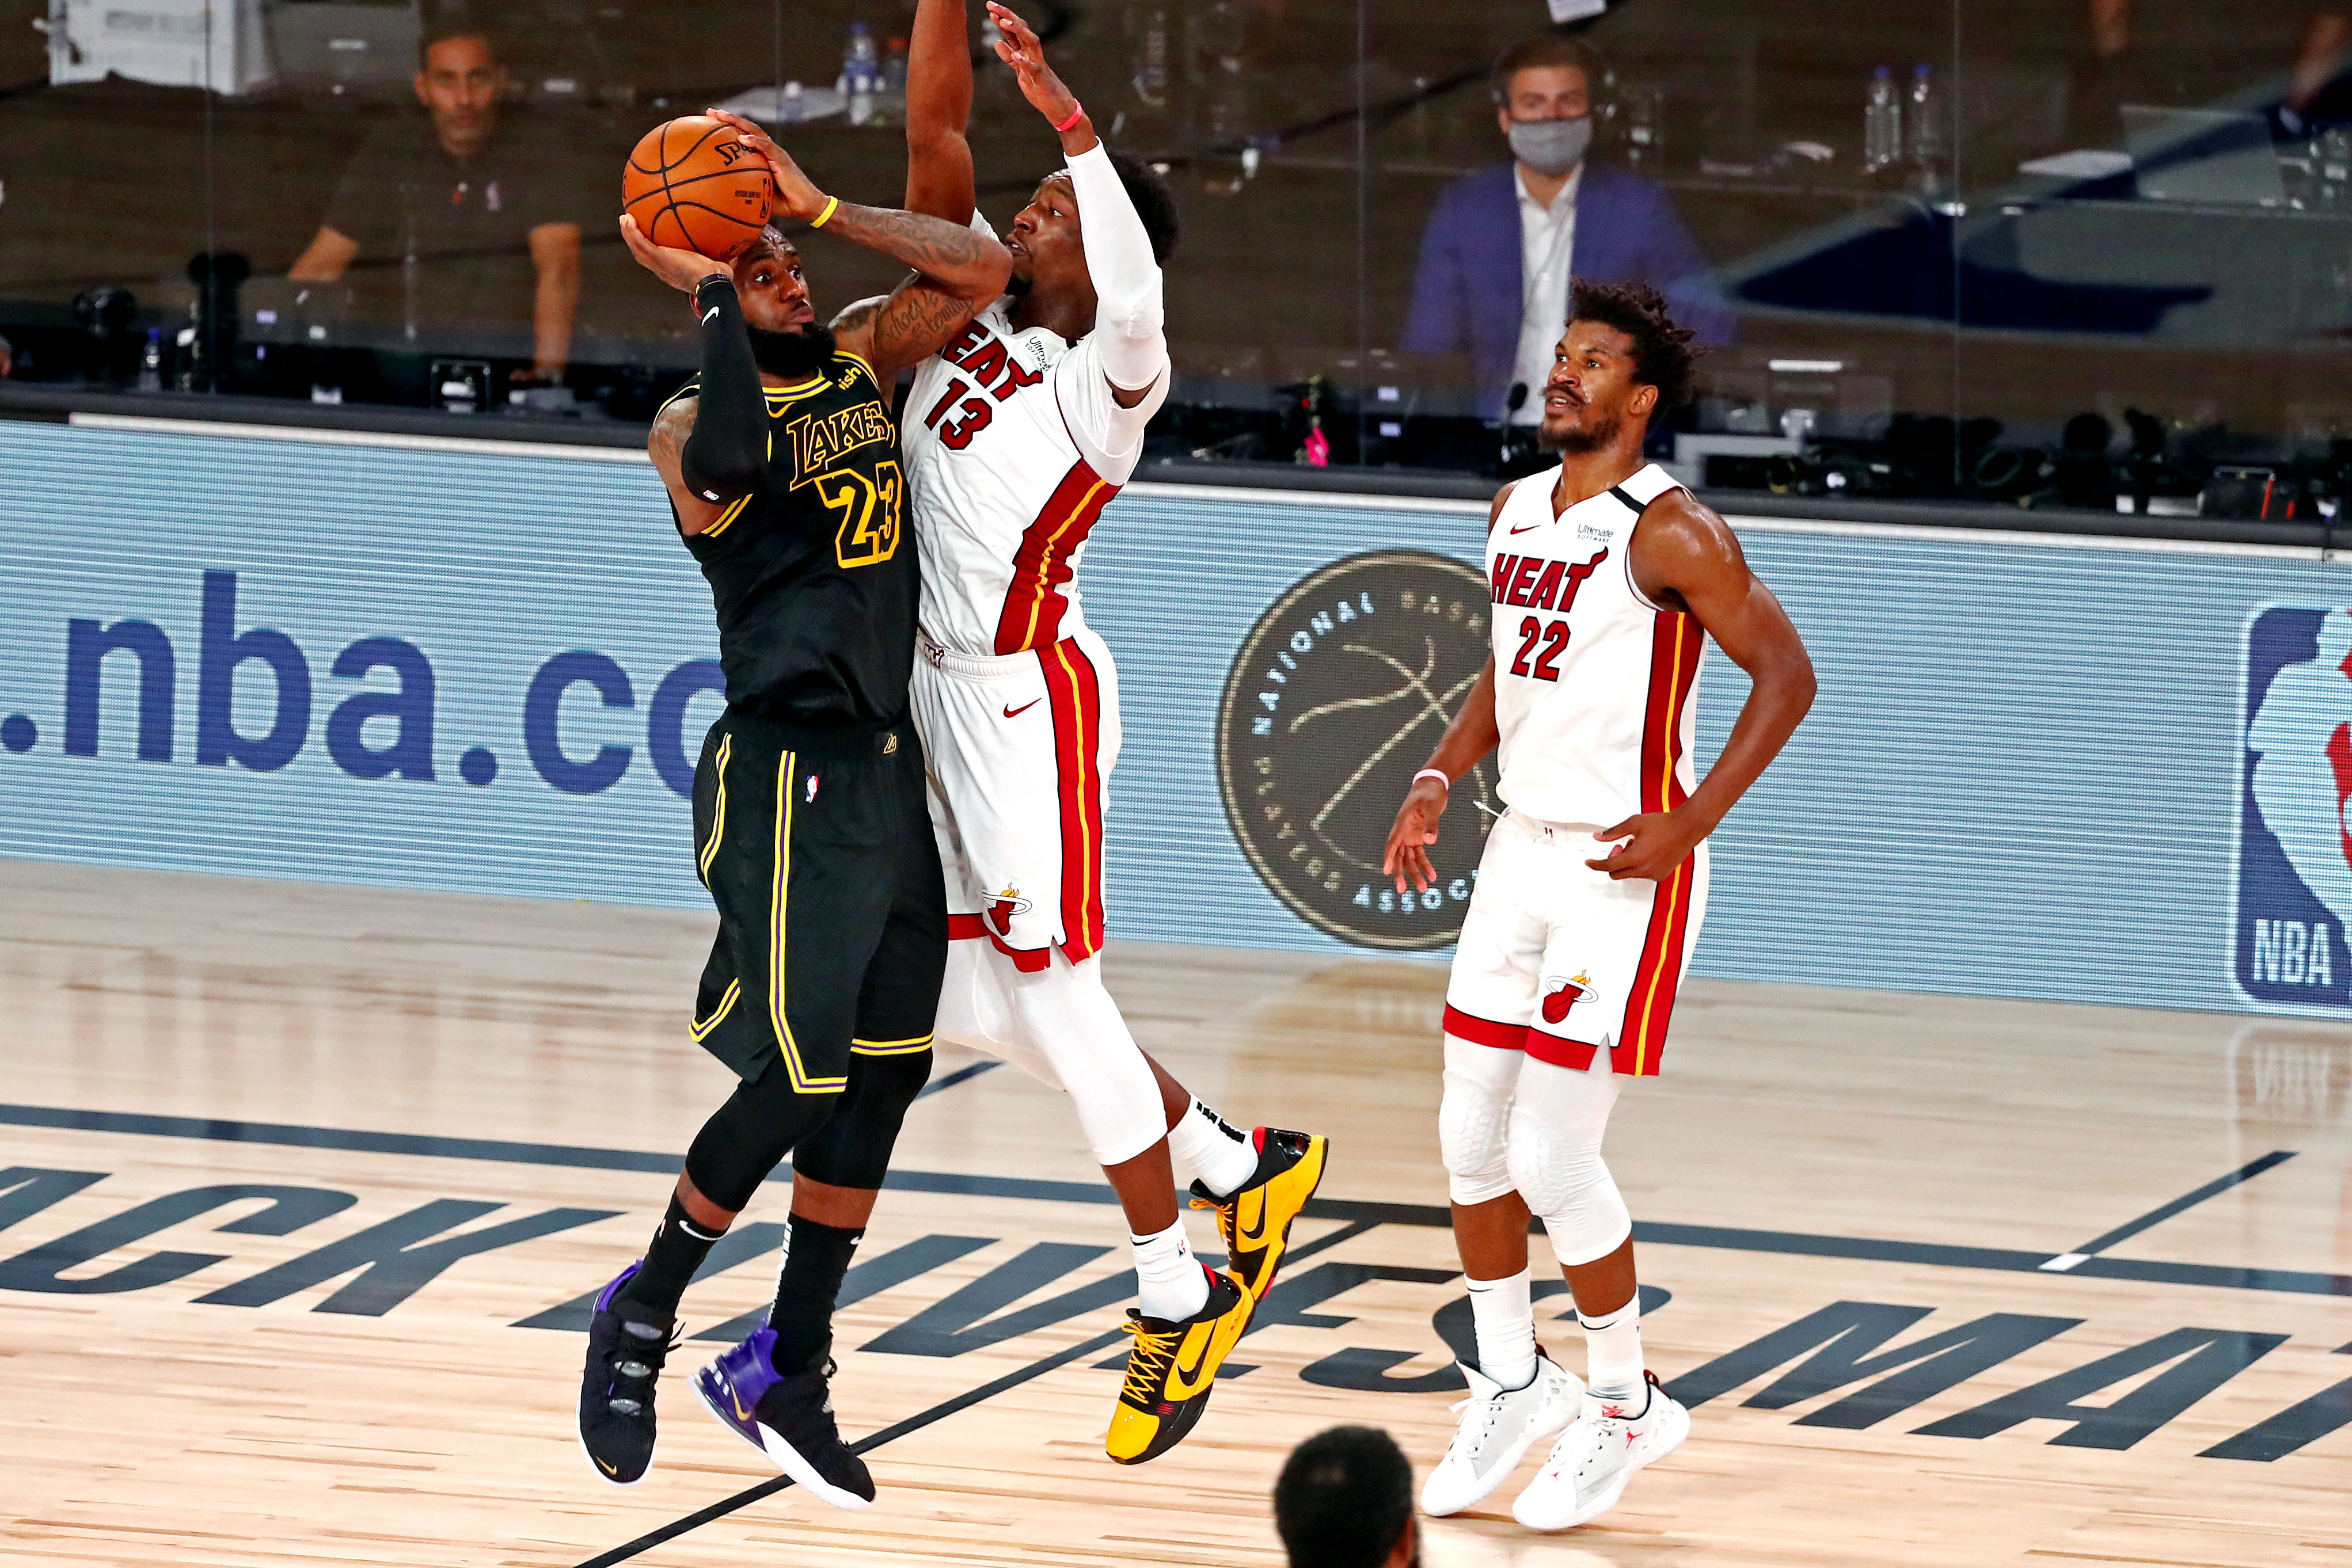 Highest NBA Player For Season 2019-2020 is Lebron James